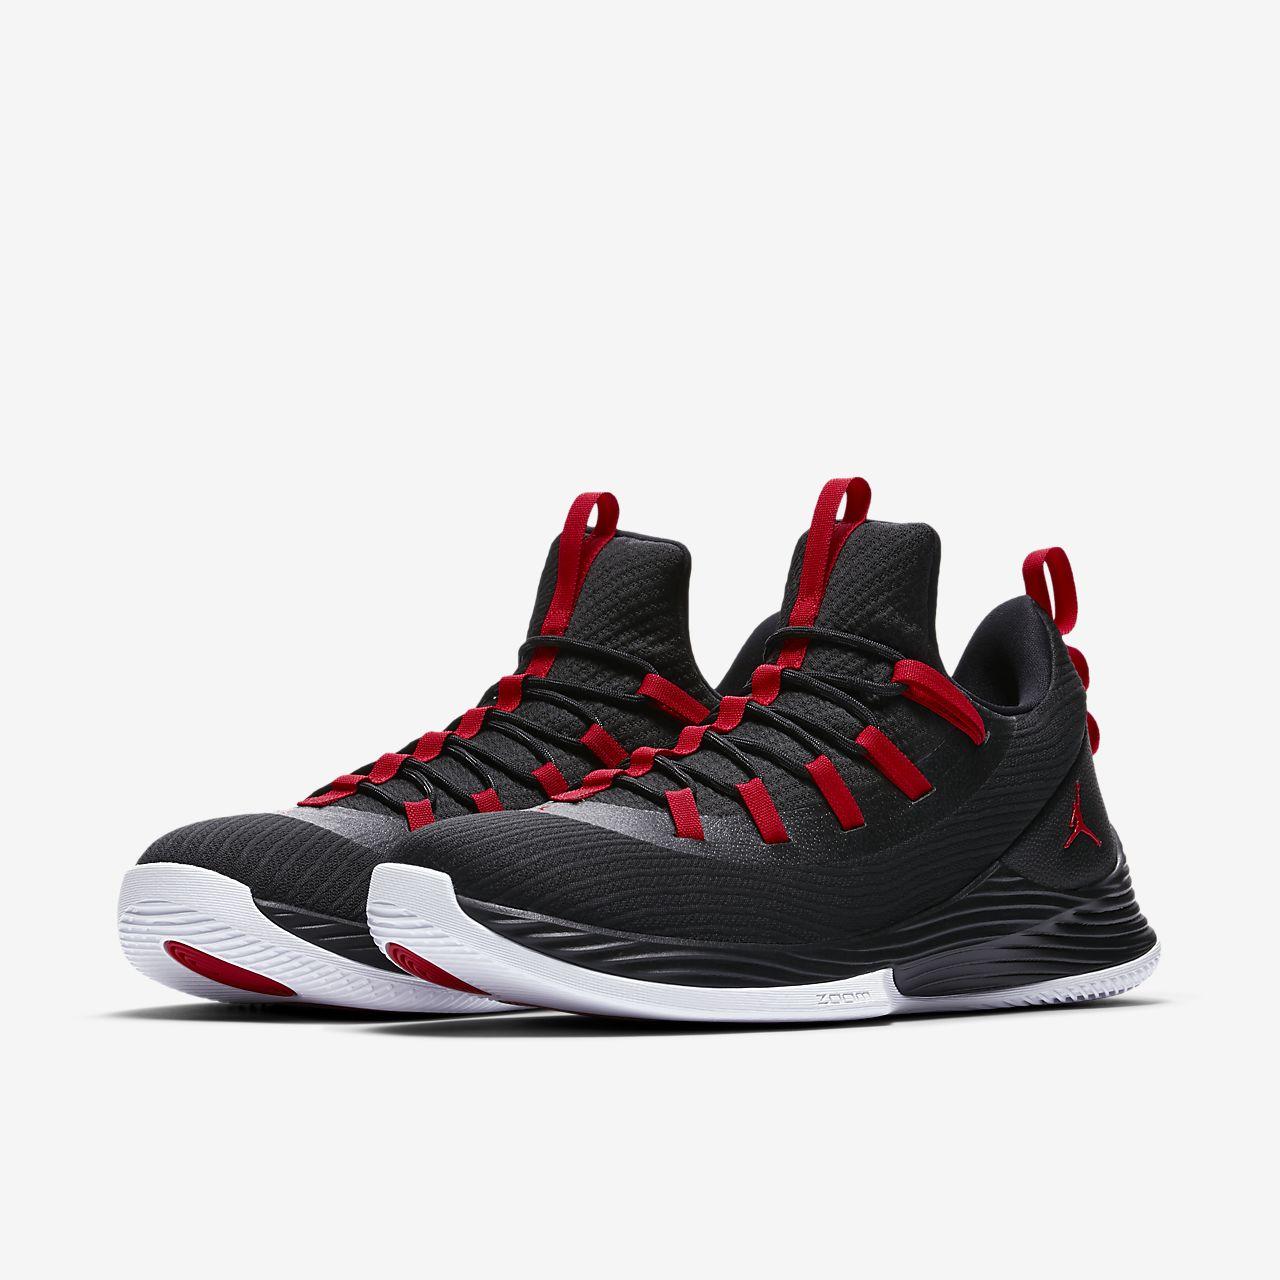 Jordan ULTRA FLY 2 LOW - Basketball shoes - black/white CBAsCAbn